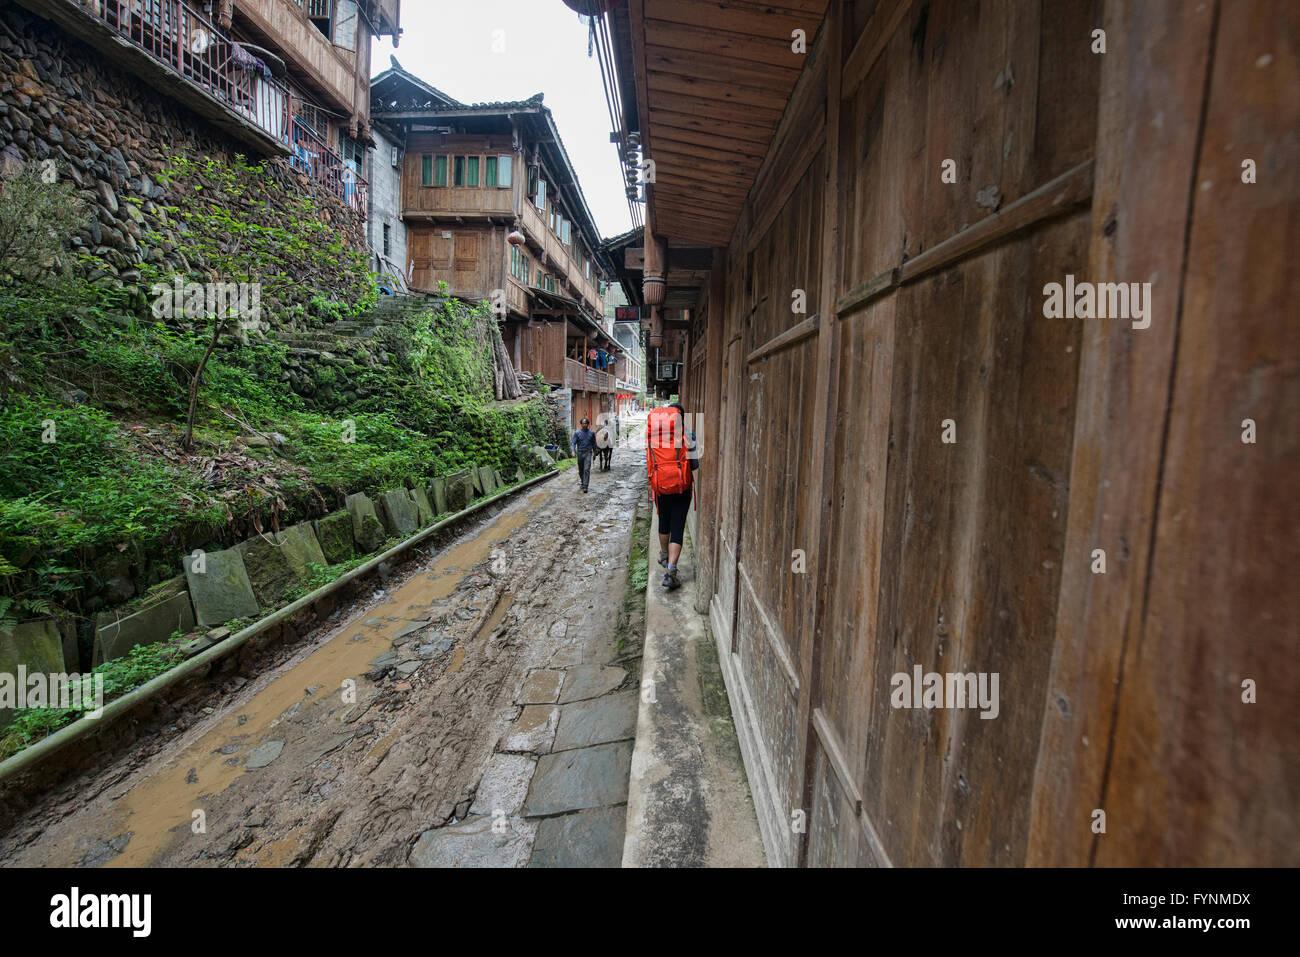 Trekking throught the old Yao village of Dazhai, Guangxi Autonomous Region, China Stock Photo